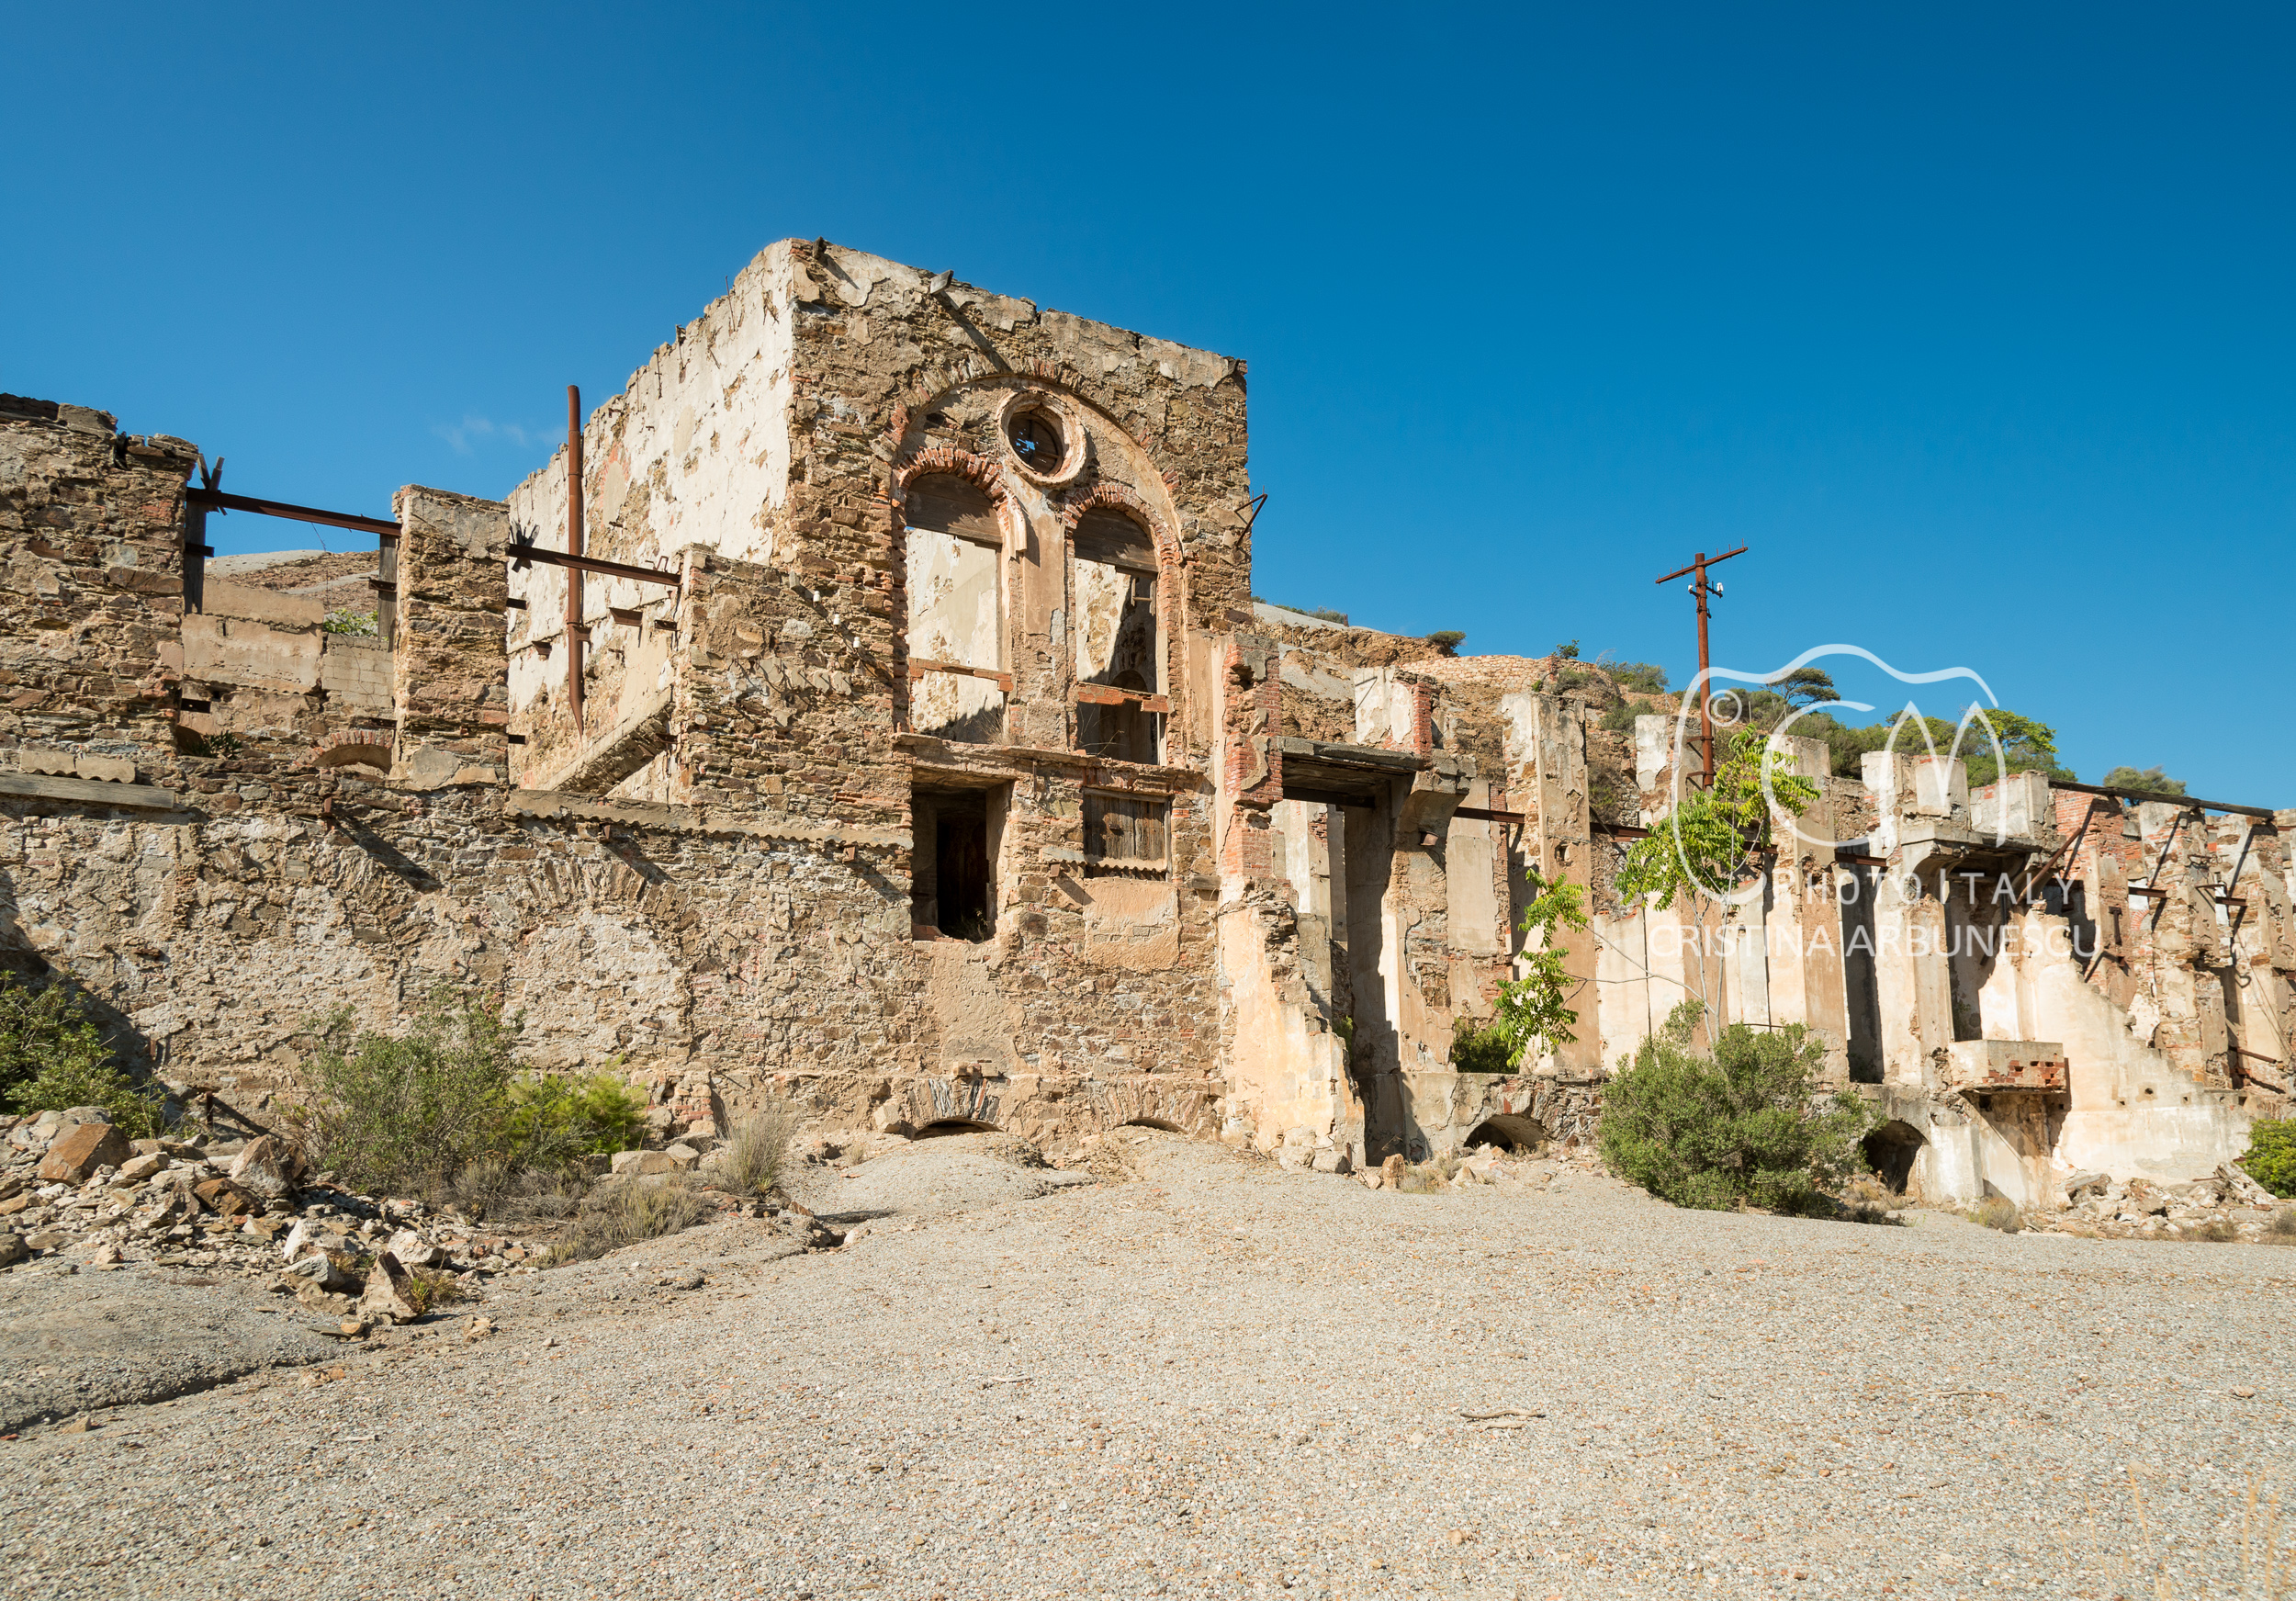 Brassey Washery (Laveria Brassey), Naracauli, between Ingurtosu and Piscinas, Sardegna